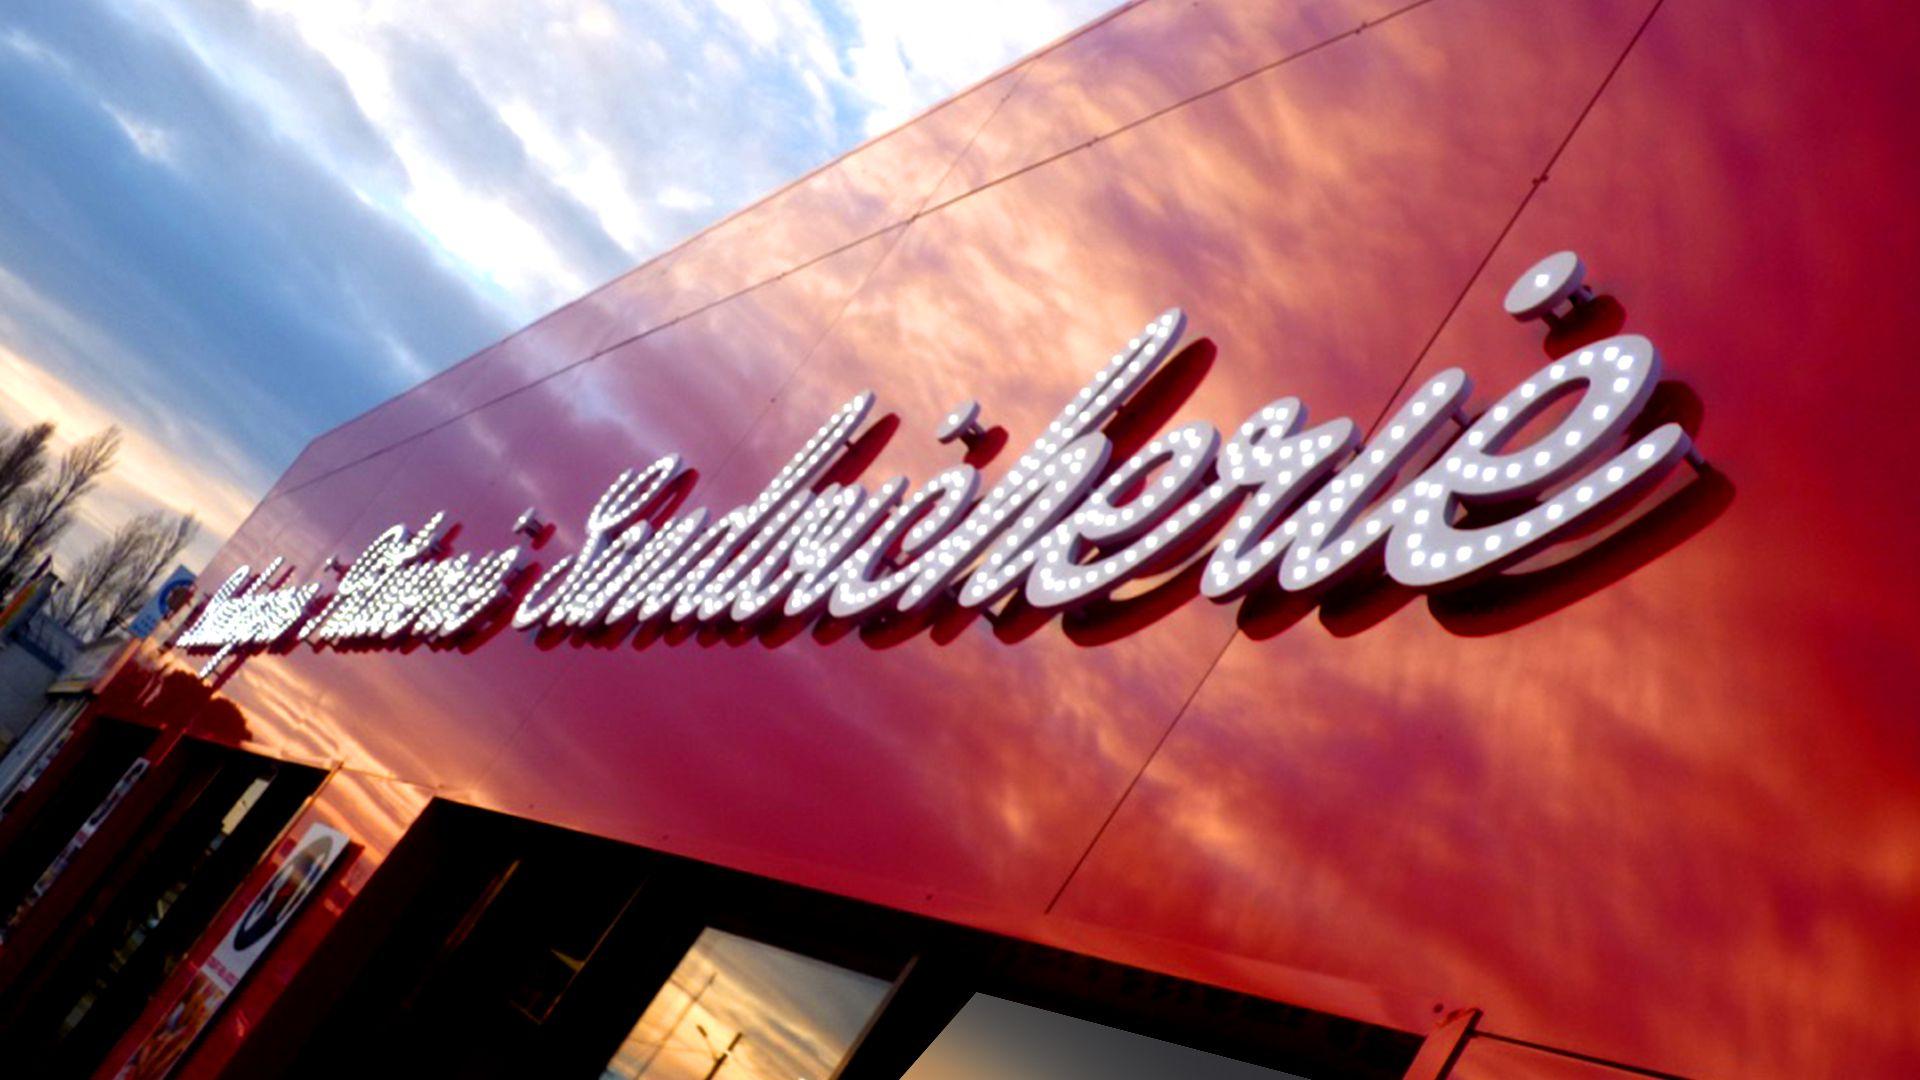 Enseigne lumineuse Boulangerie